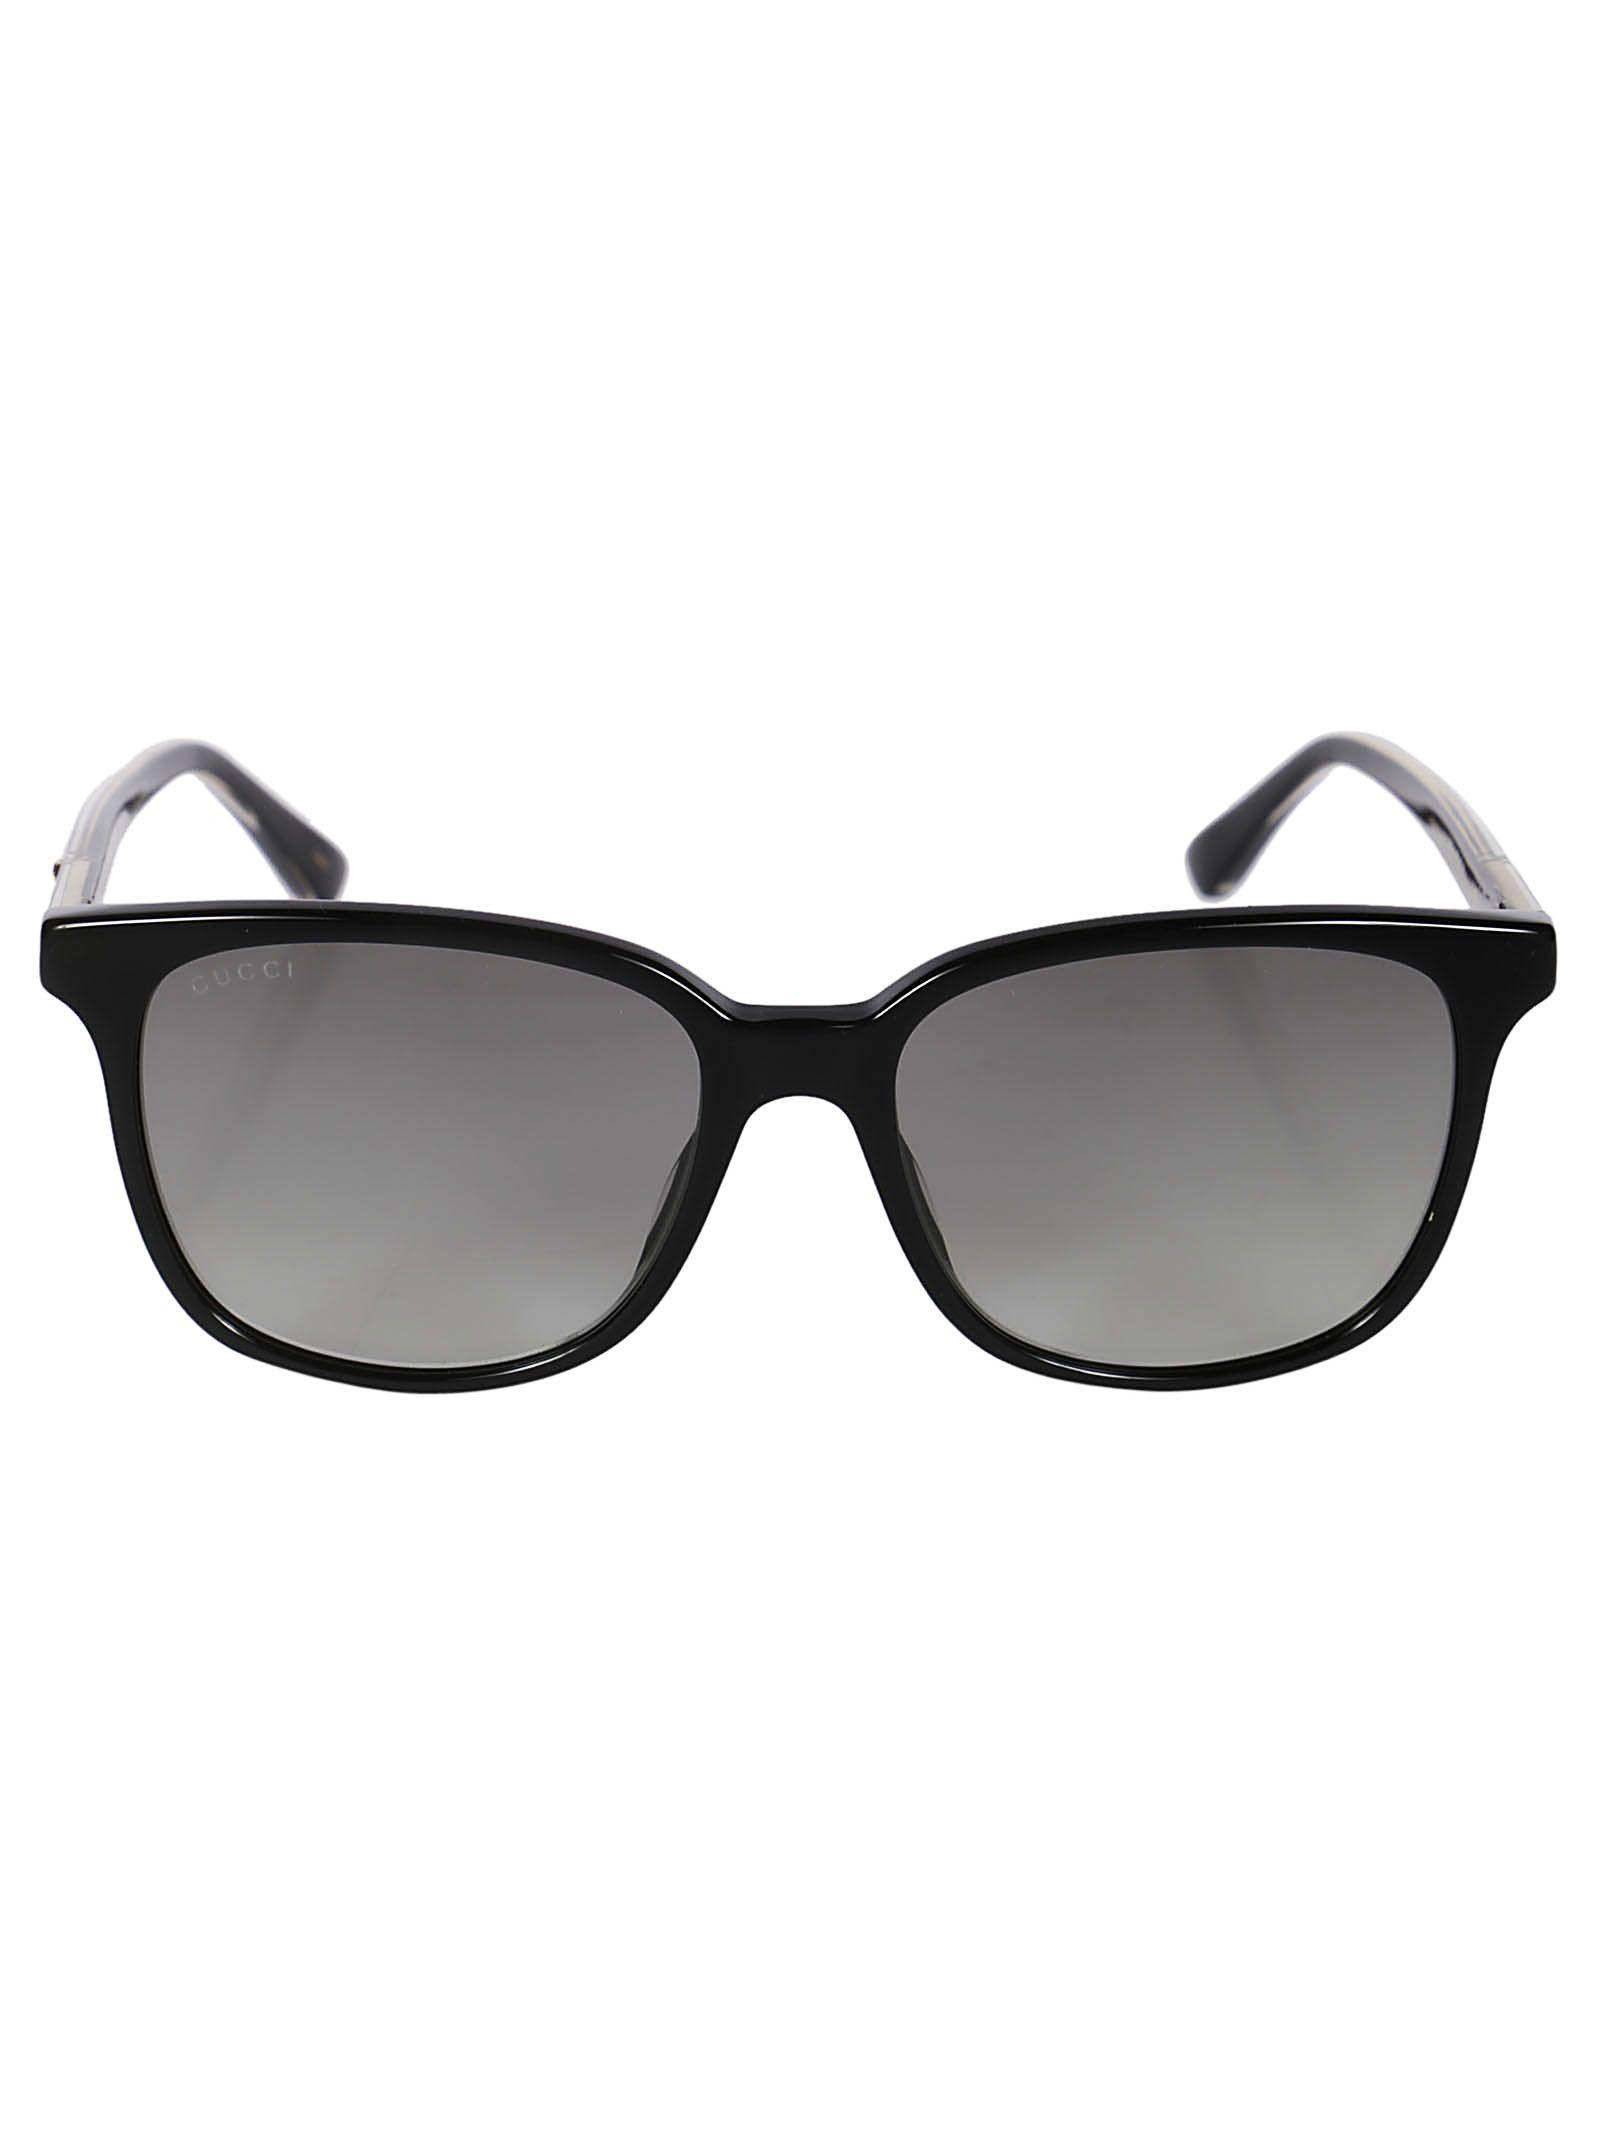 Gucci Square Cat Eye Sunglasses